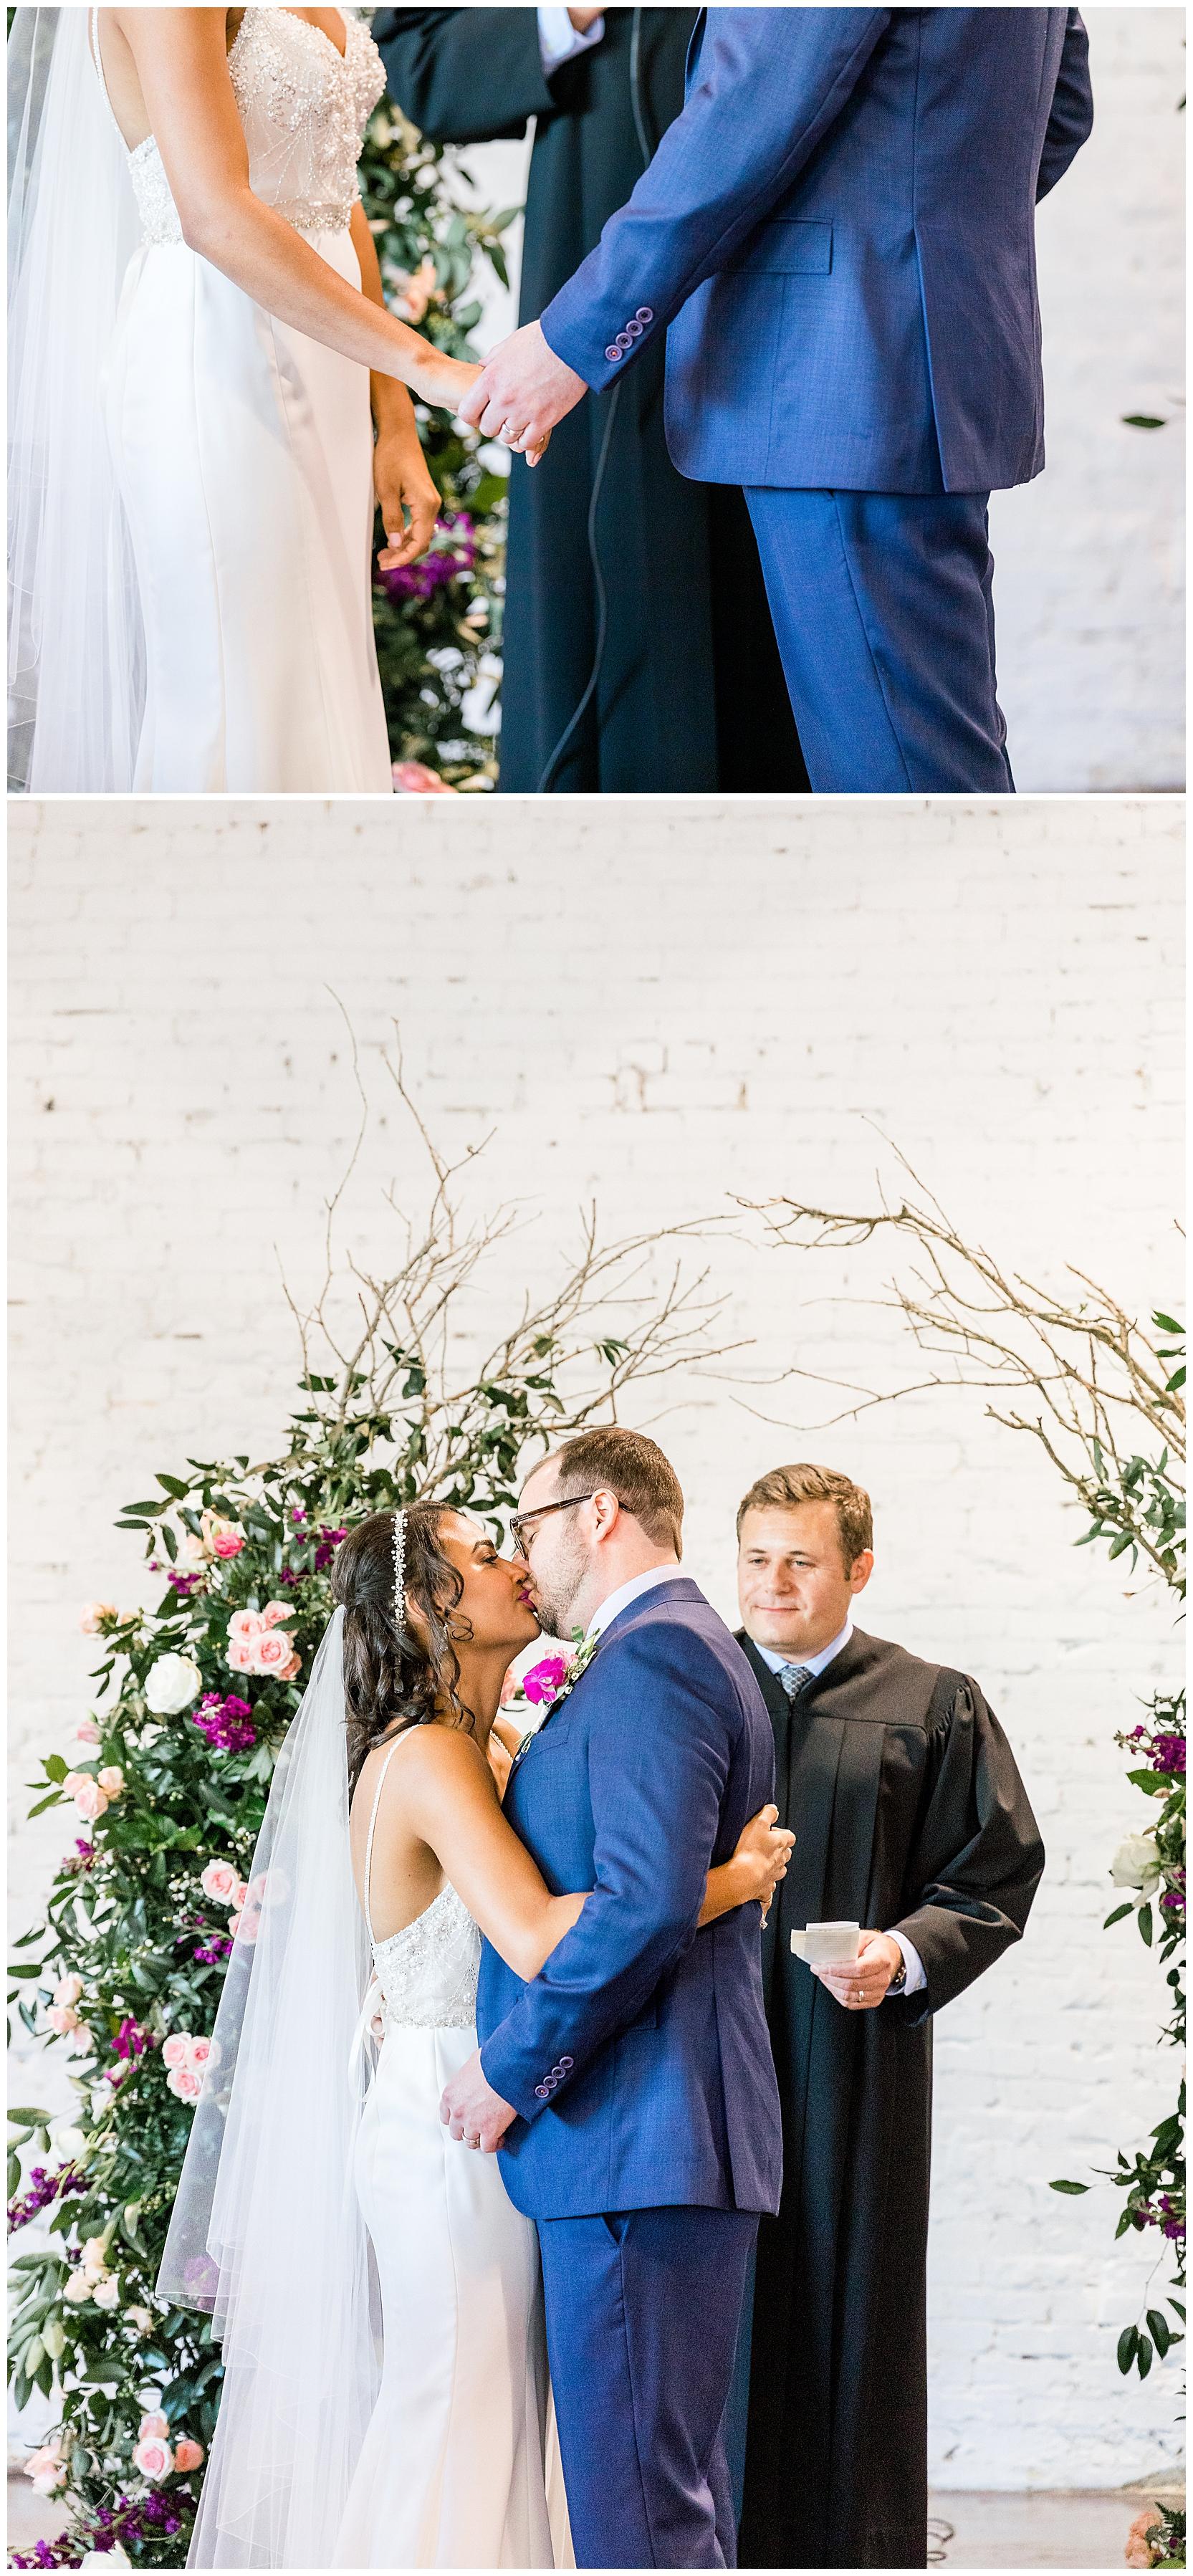 jessicafredericks_lakeland_tampa_wedding_purple_crazy hour_0050.jpg